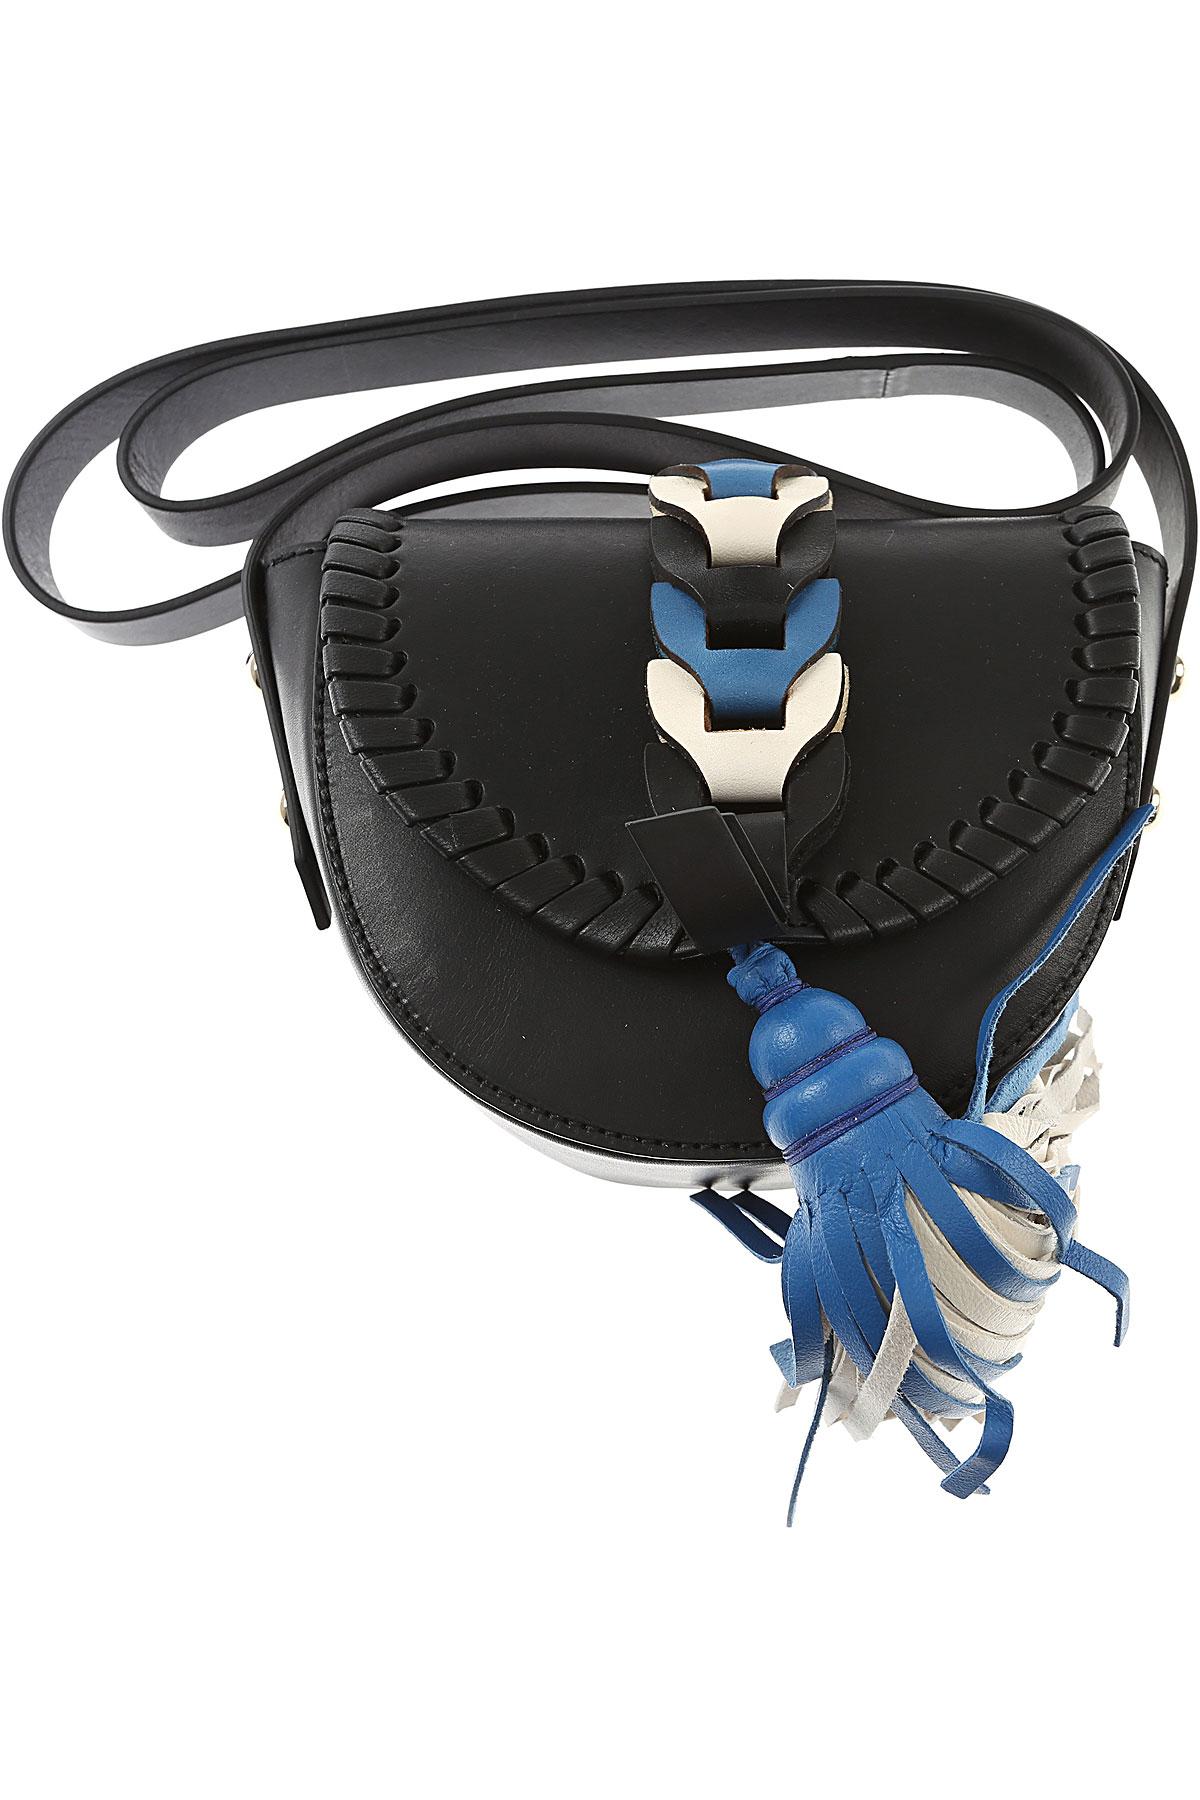 Valentino Shoulder Bag for Women, Red Valentino, Black, Leather, 2017 USA-456021